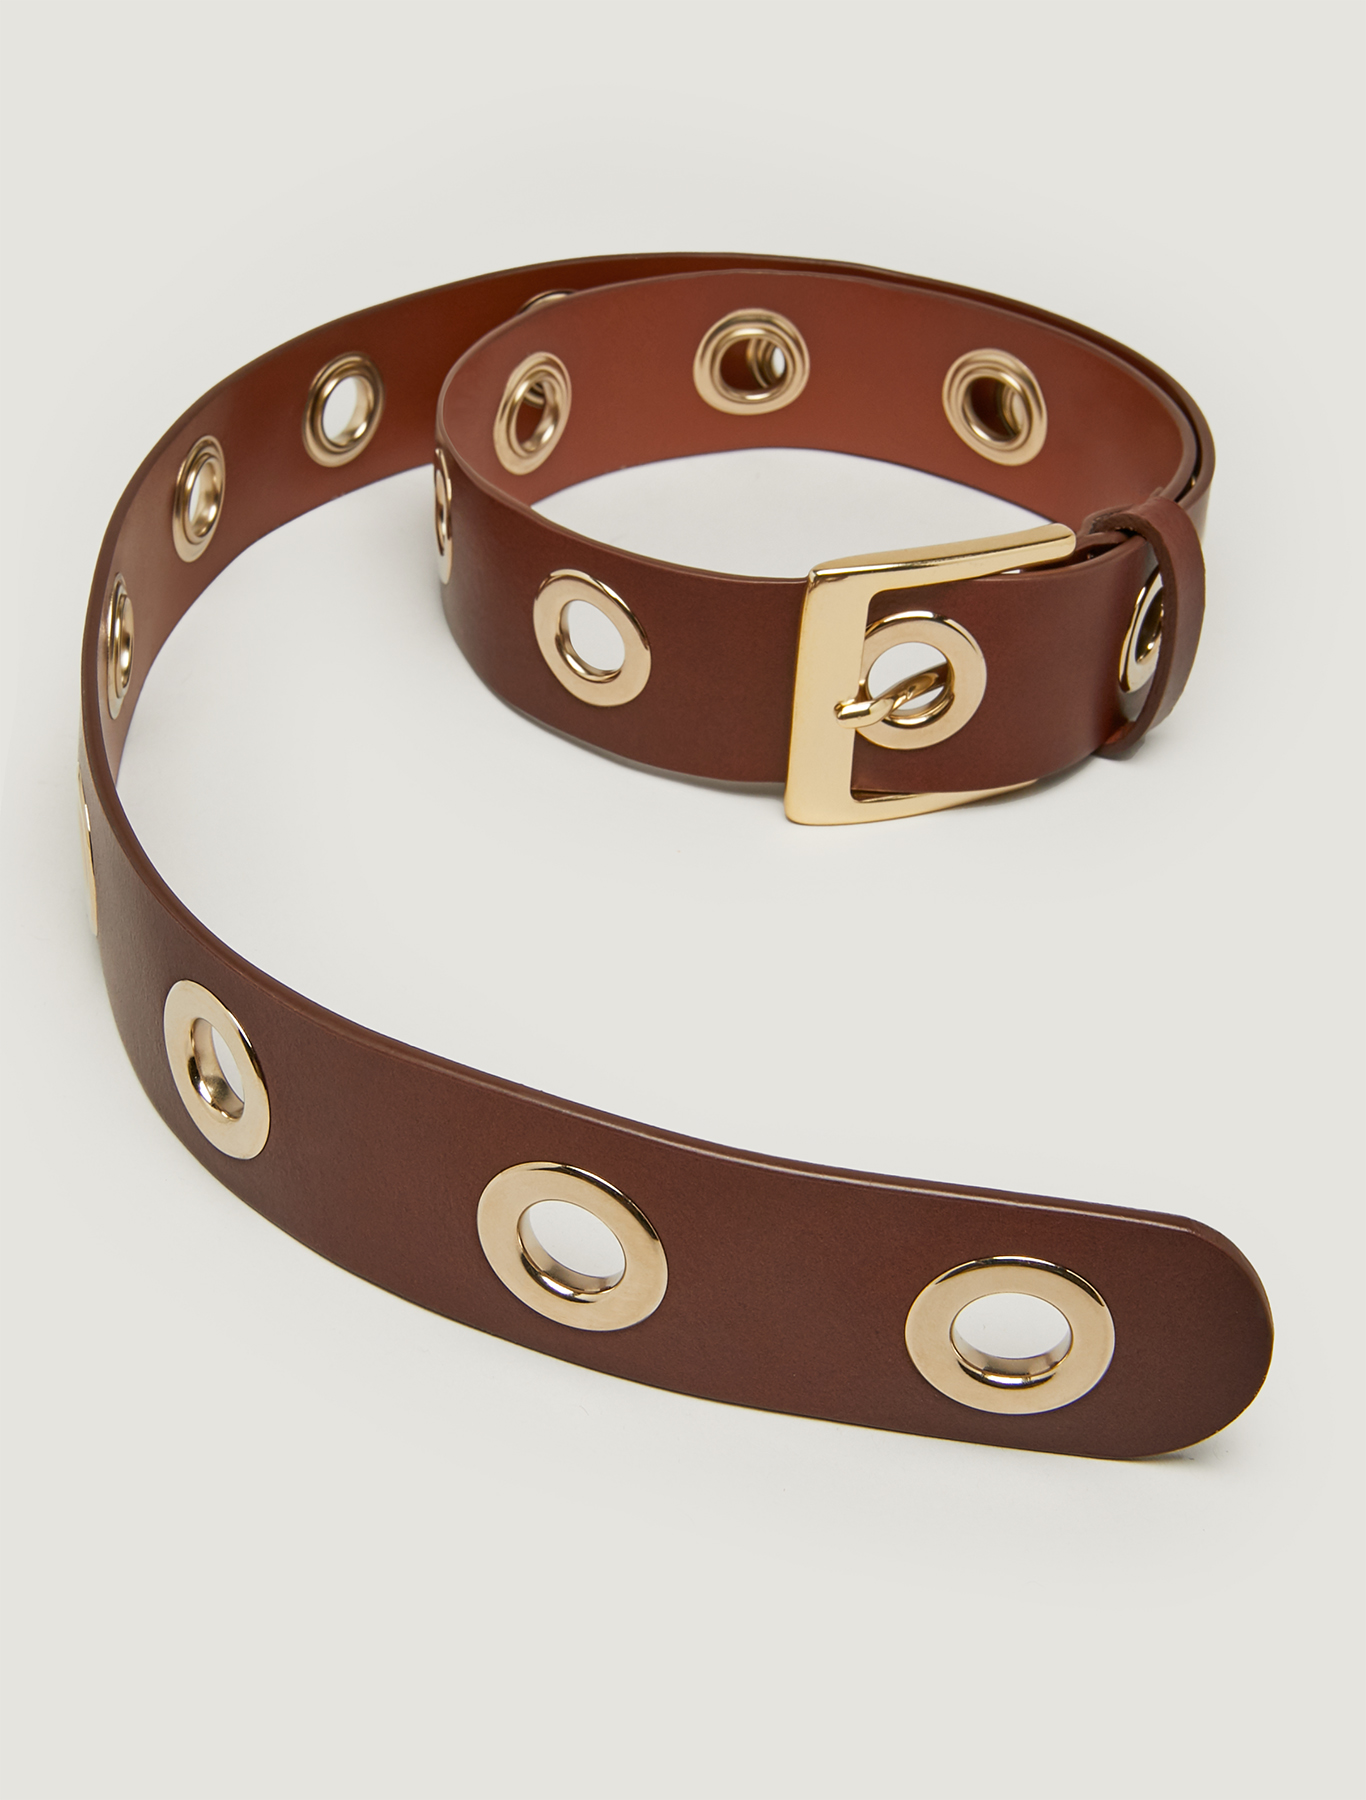 Belt with metallic eyelets. - tan - pennyblack